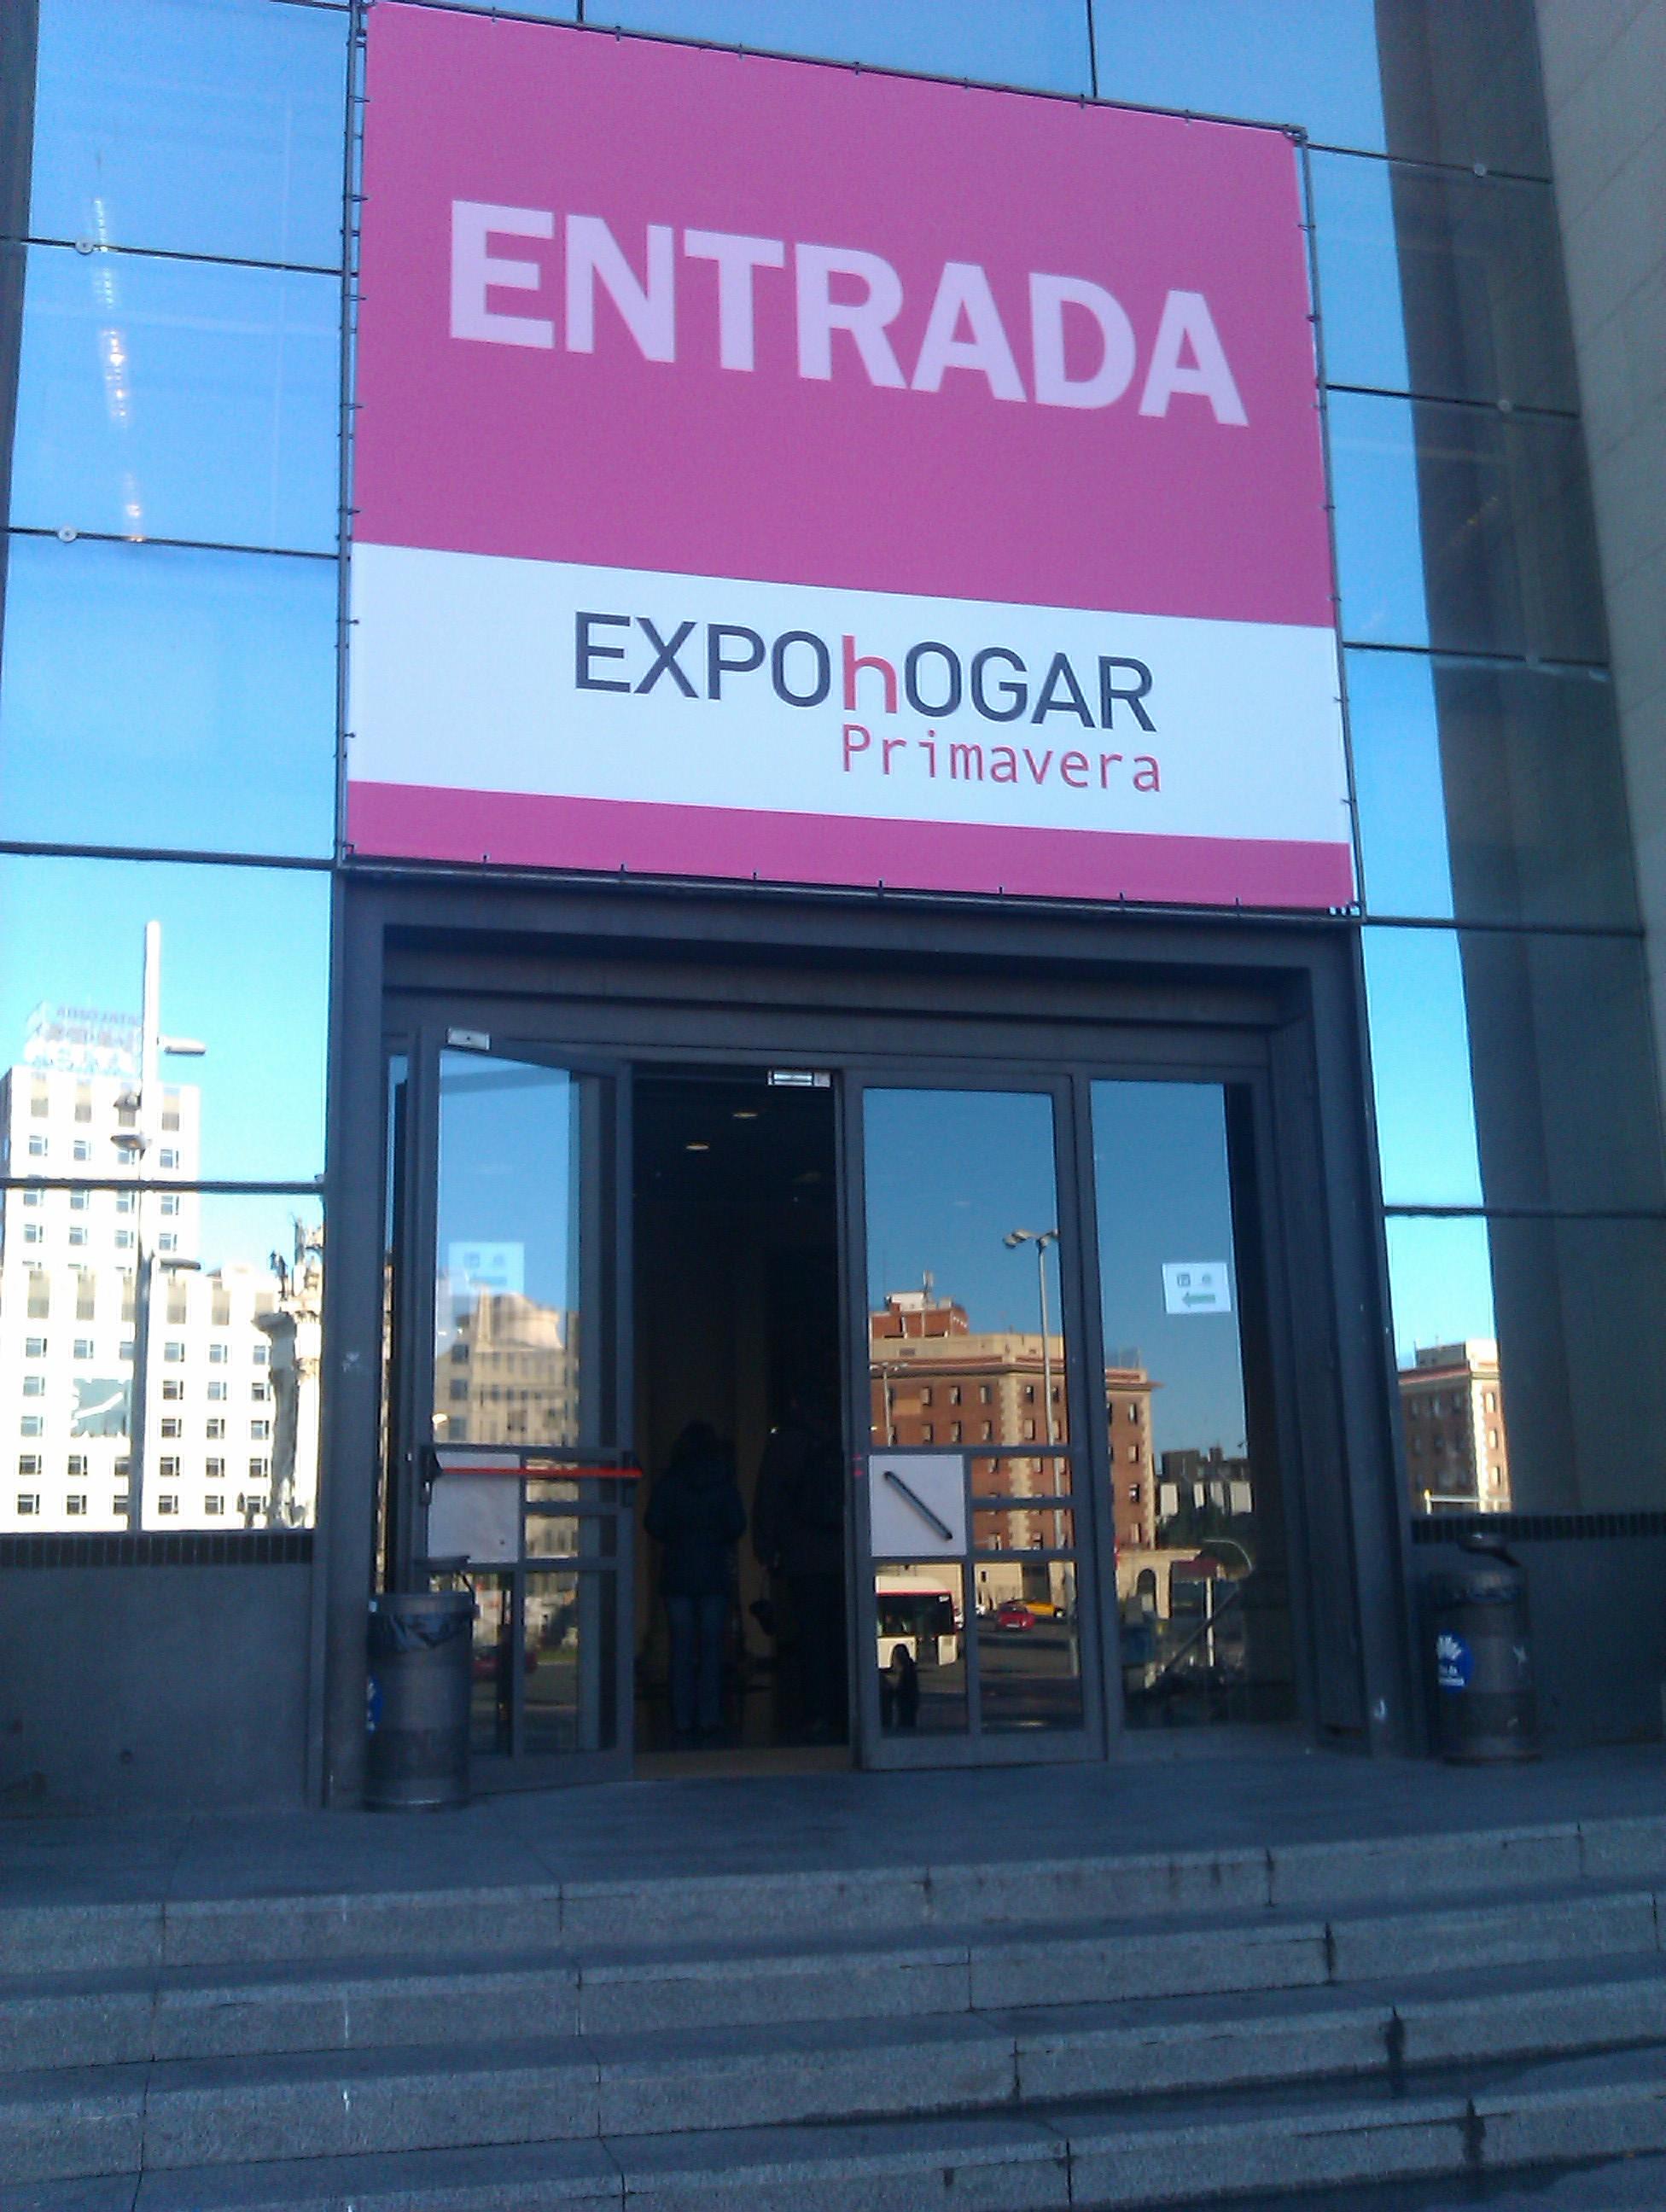 ExpoHogar Primavera